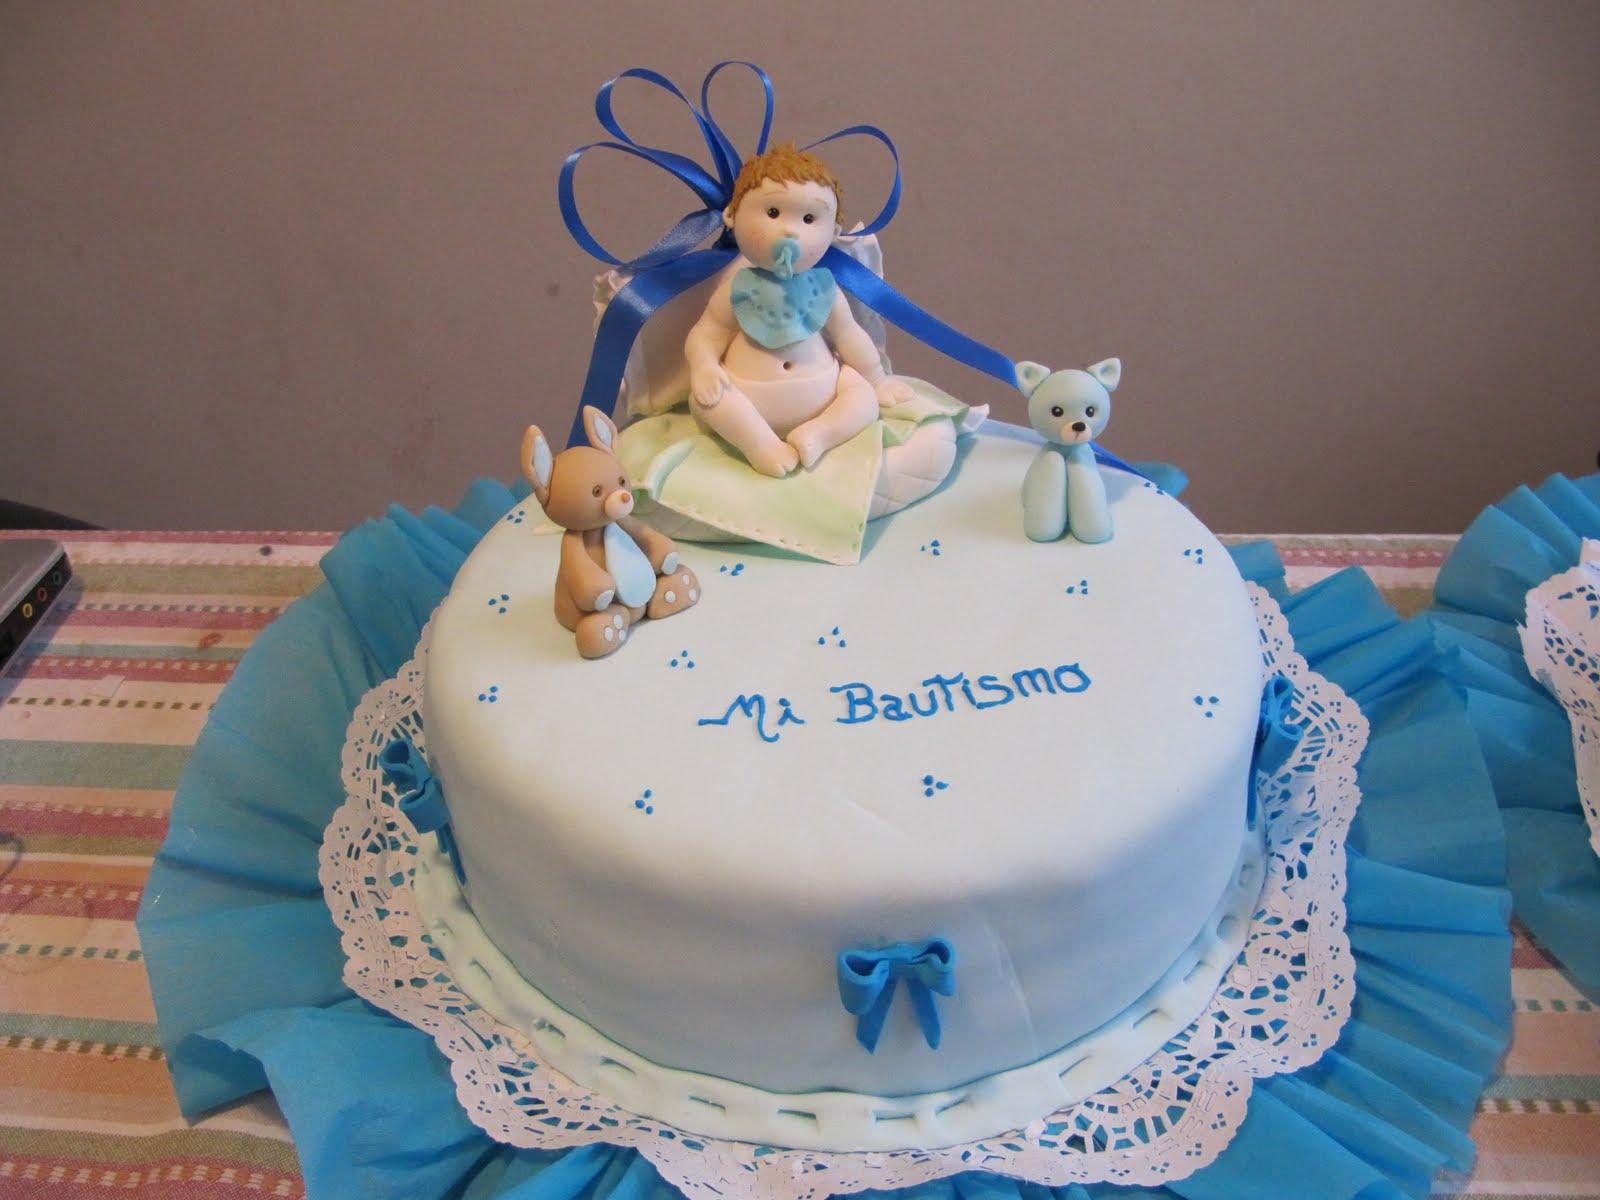 Tortas Infantiles | Tortas Decoradas | Tortas: Fotos de Tortas